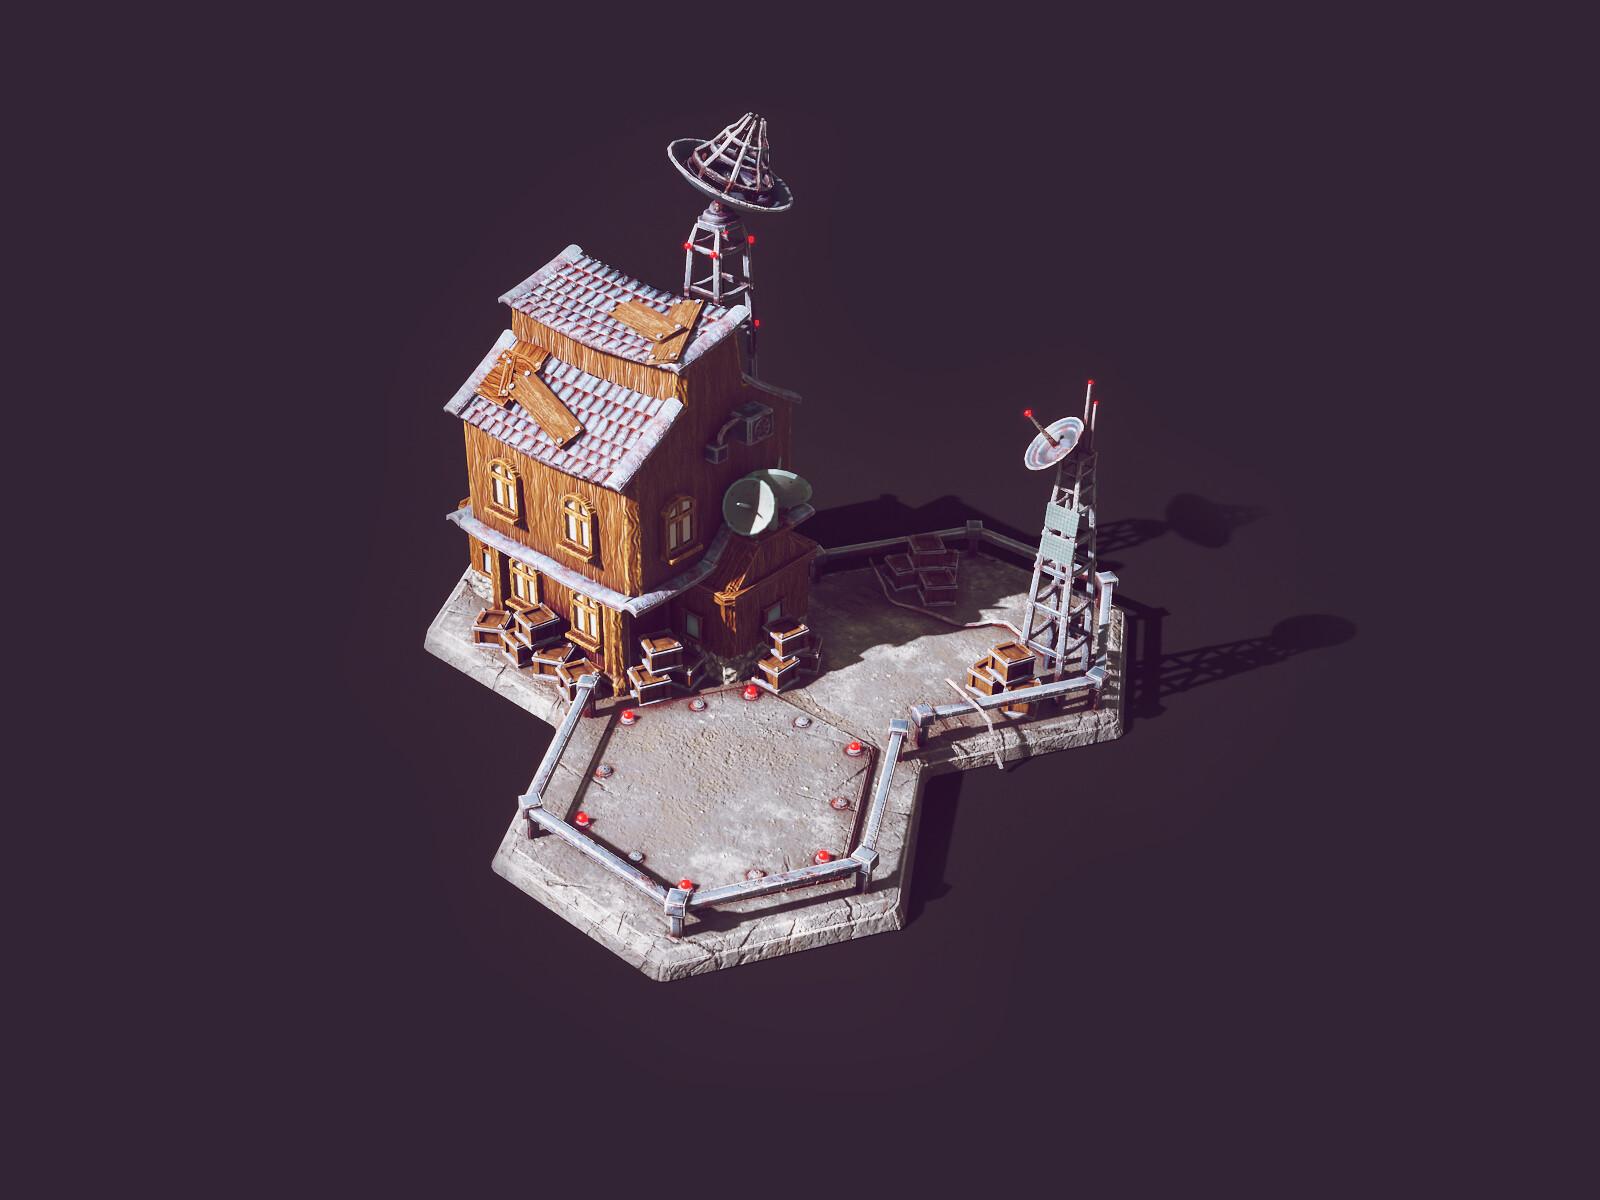 3d Low Poly Game Buildings | Low Poly Illustration | City Builder | Render in Unity 2018  | Blender